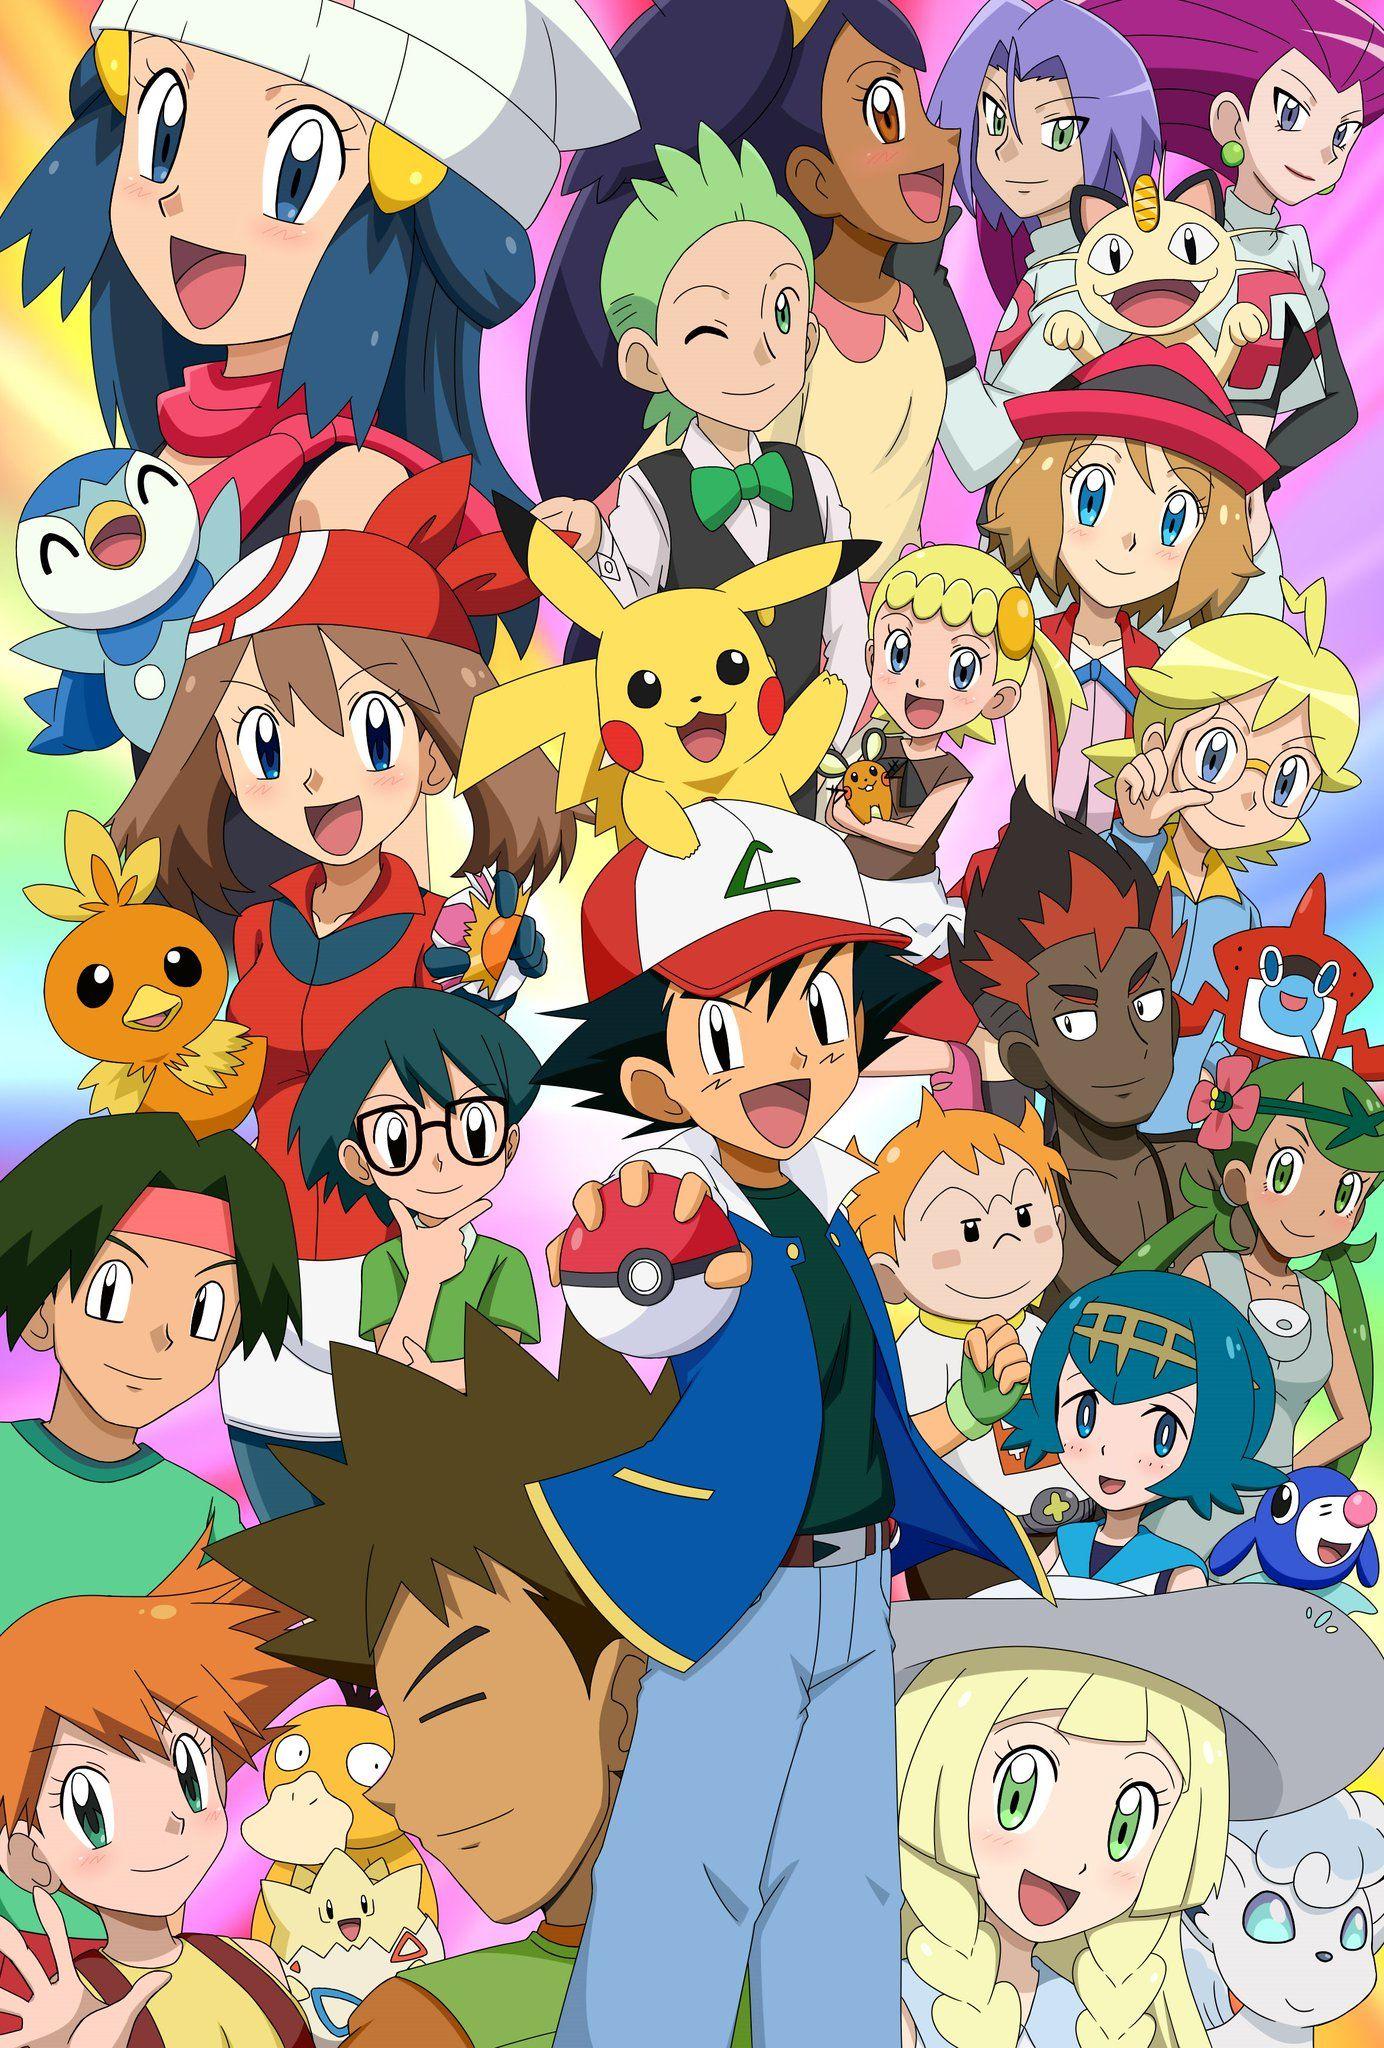 Tales Of The Pokémon: The Fellowship Of The Pokémon ...